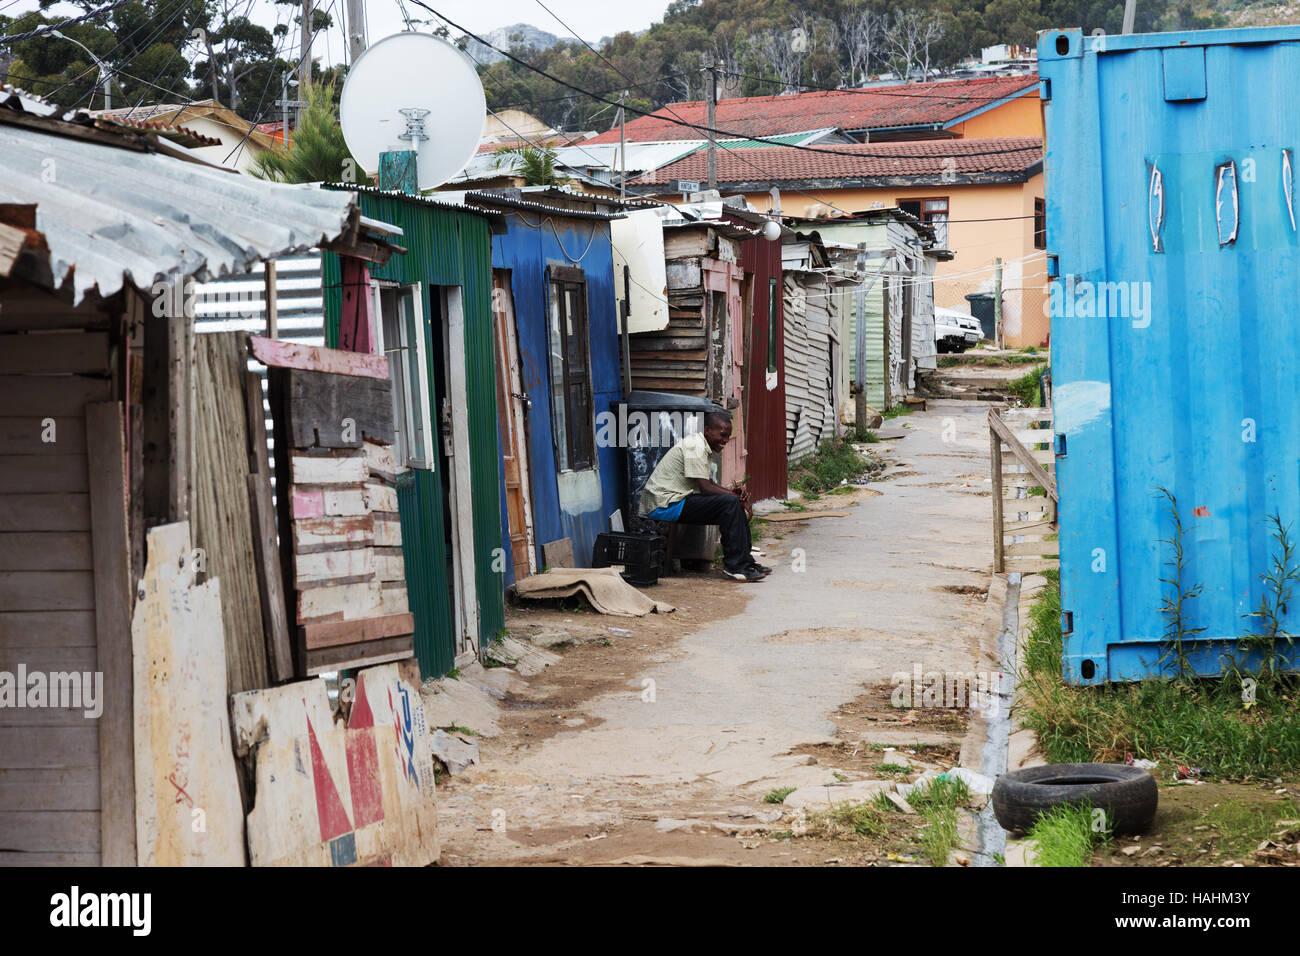 A street scene, Imizamo Yethu township, Cape Town, South Africa Stock Photo